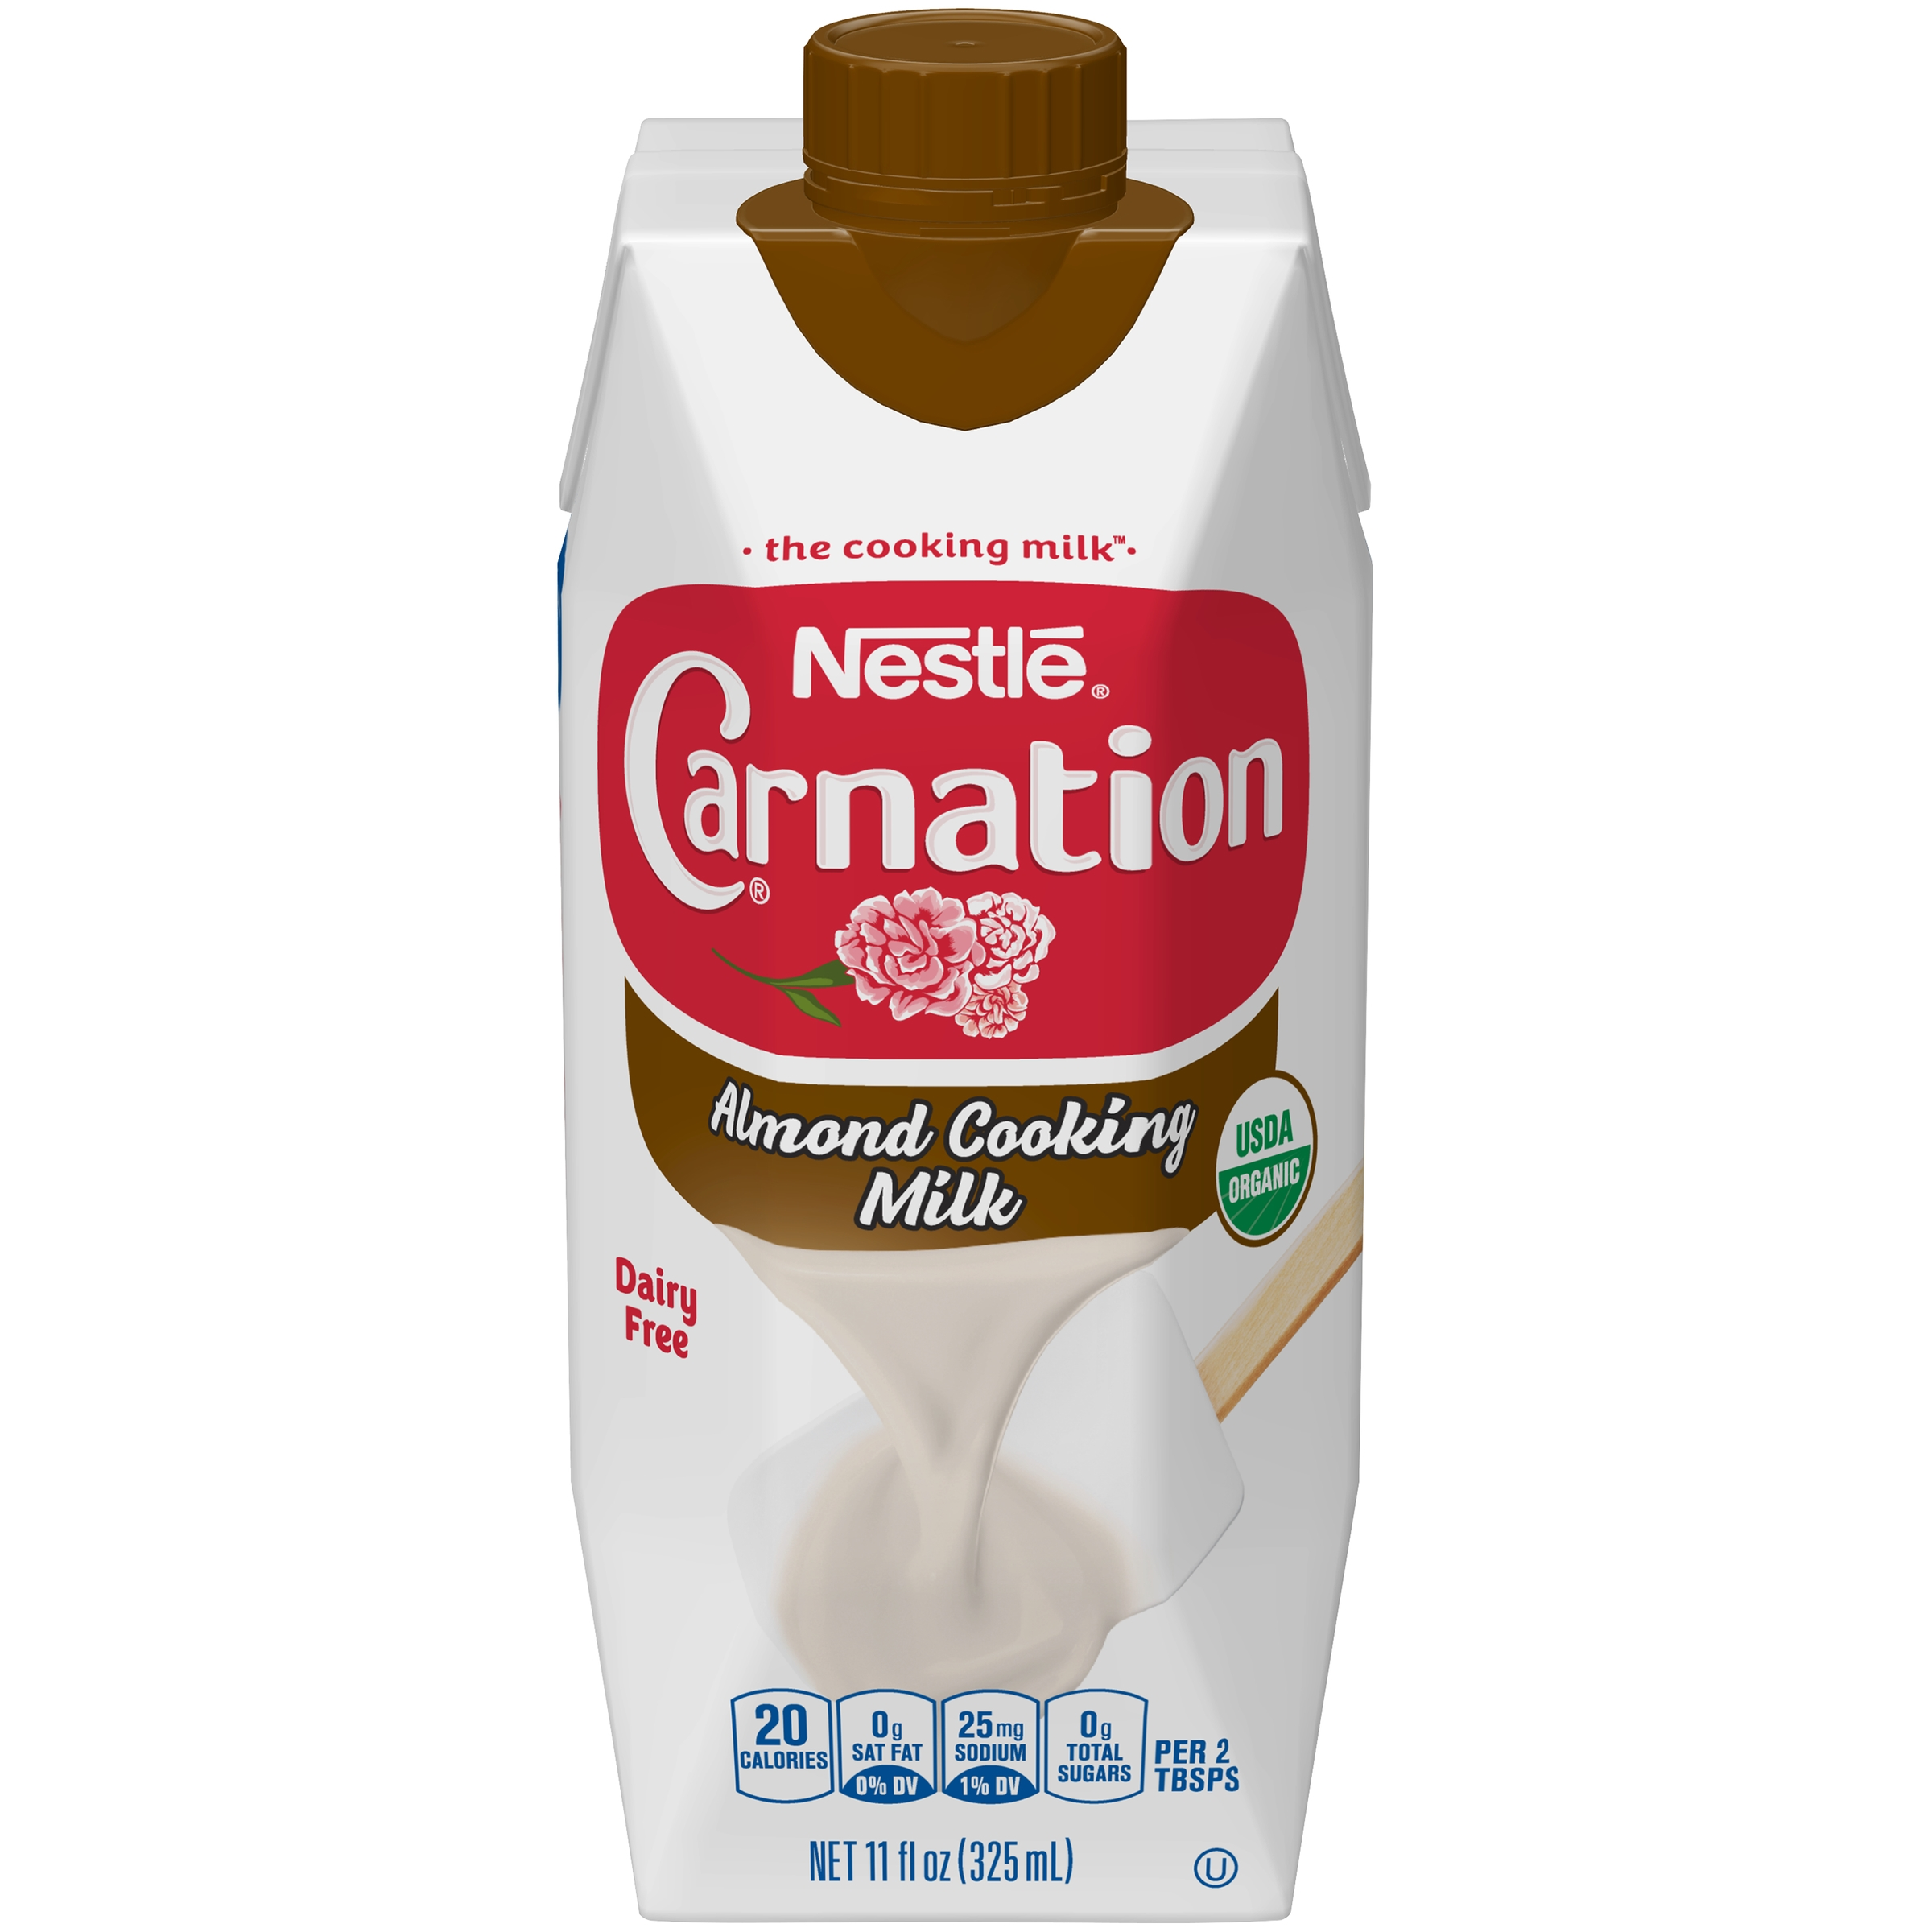 CARNATION Almond Cooking Milk – USDA Organic Milk ...